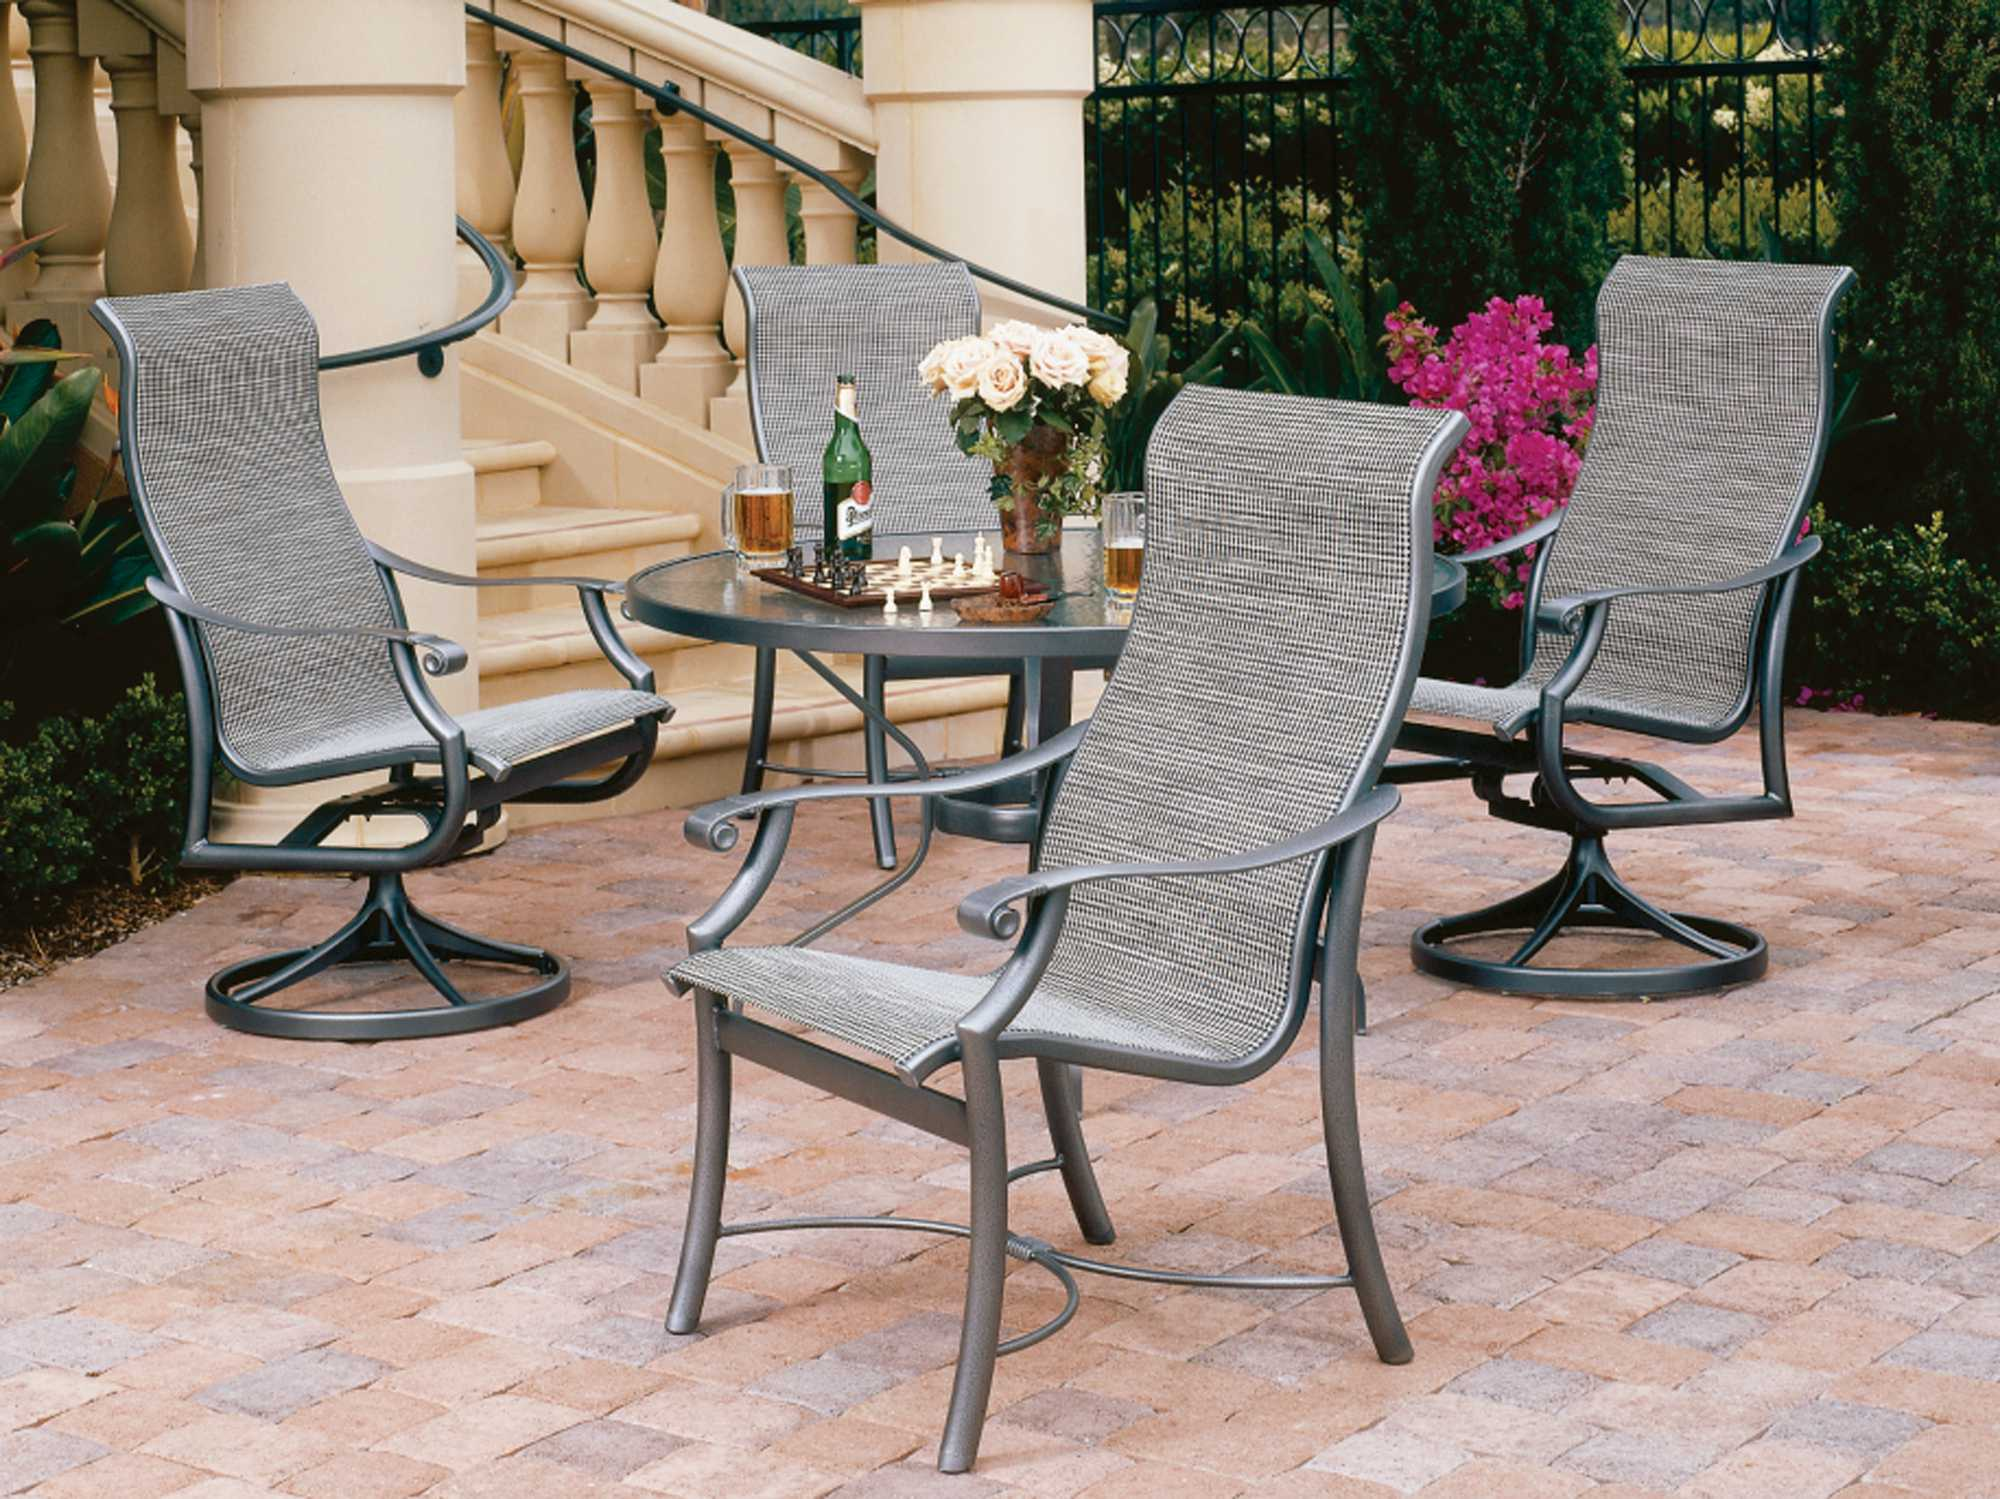 Tropitone Montreux Sling Aluminum Dining Set MTSDS - Tropitone outdoor furniture